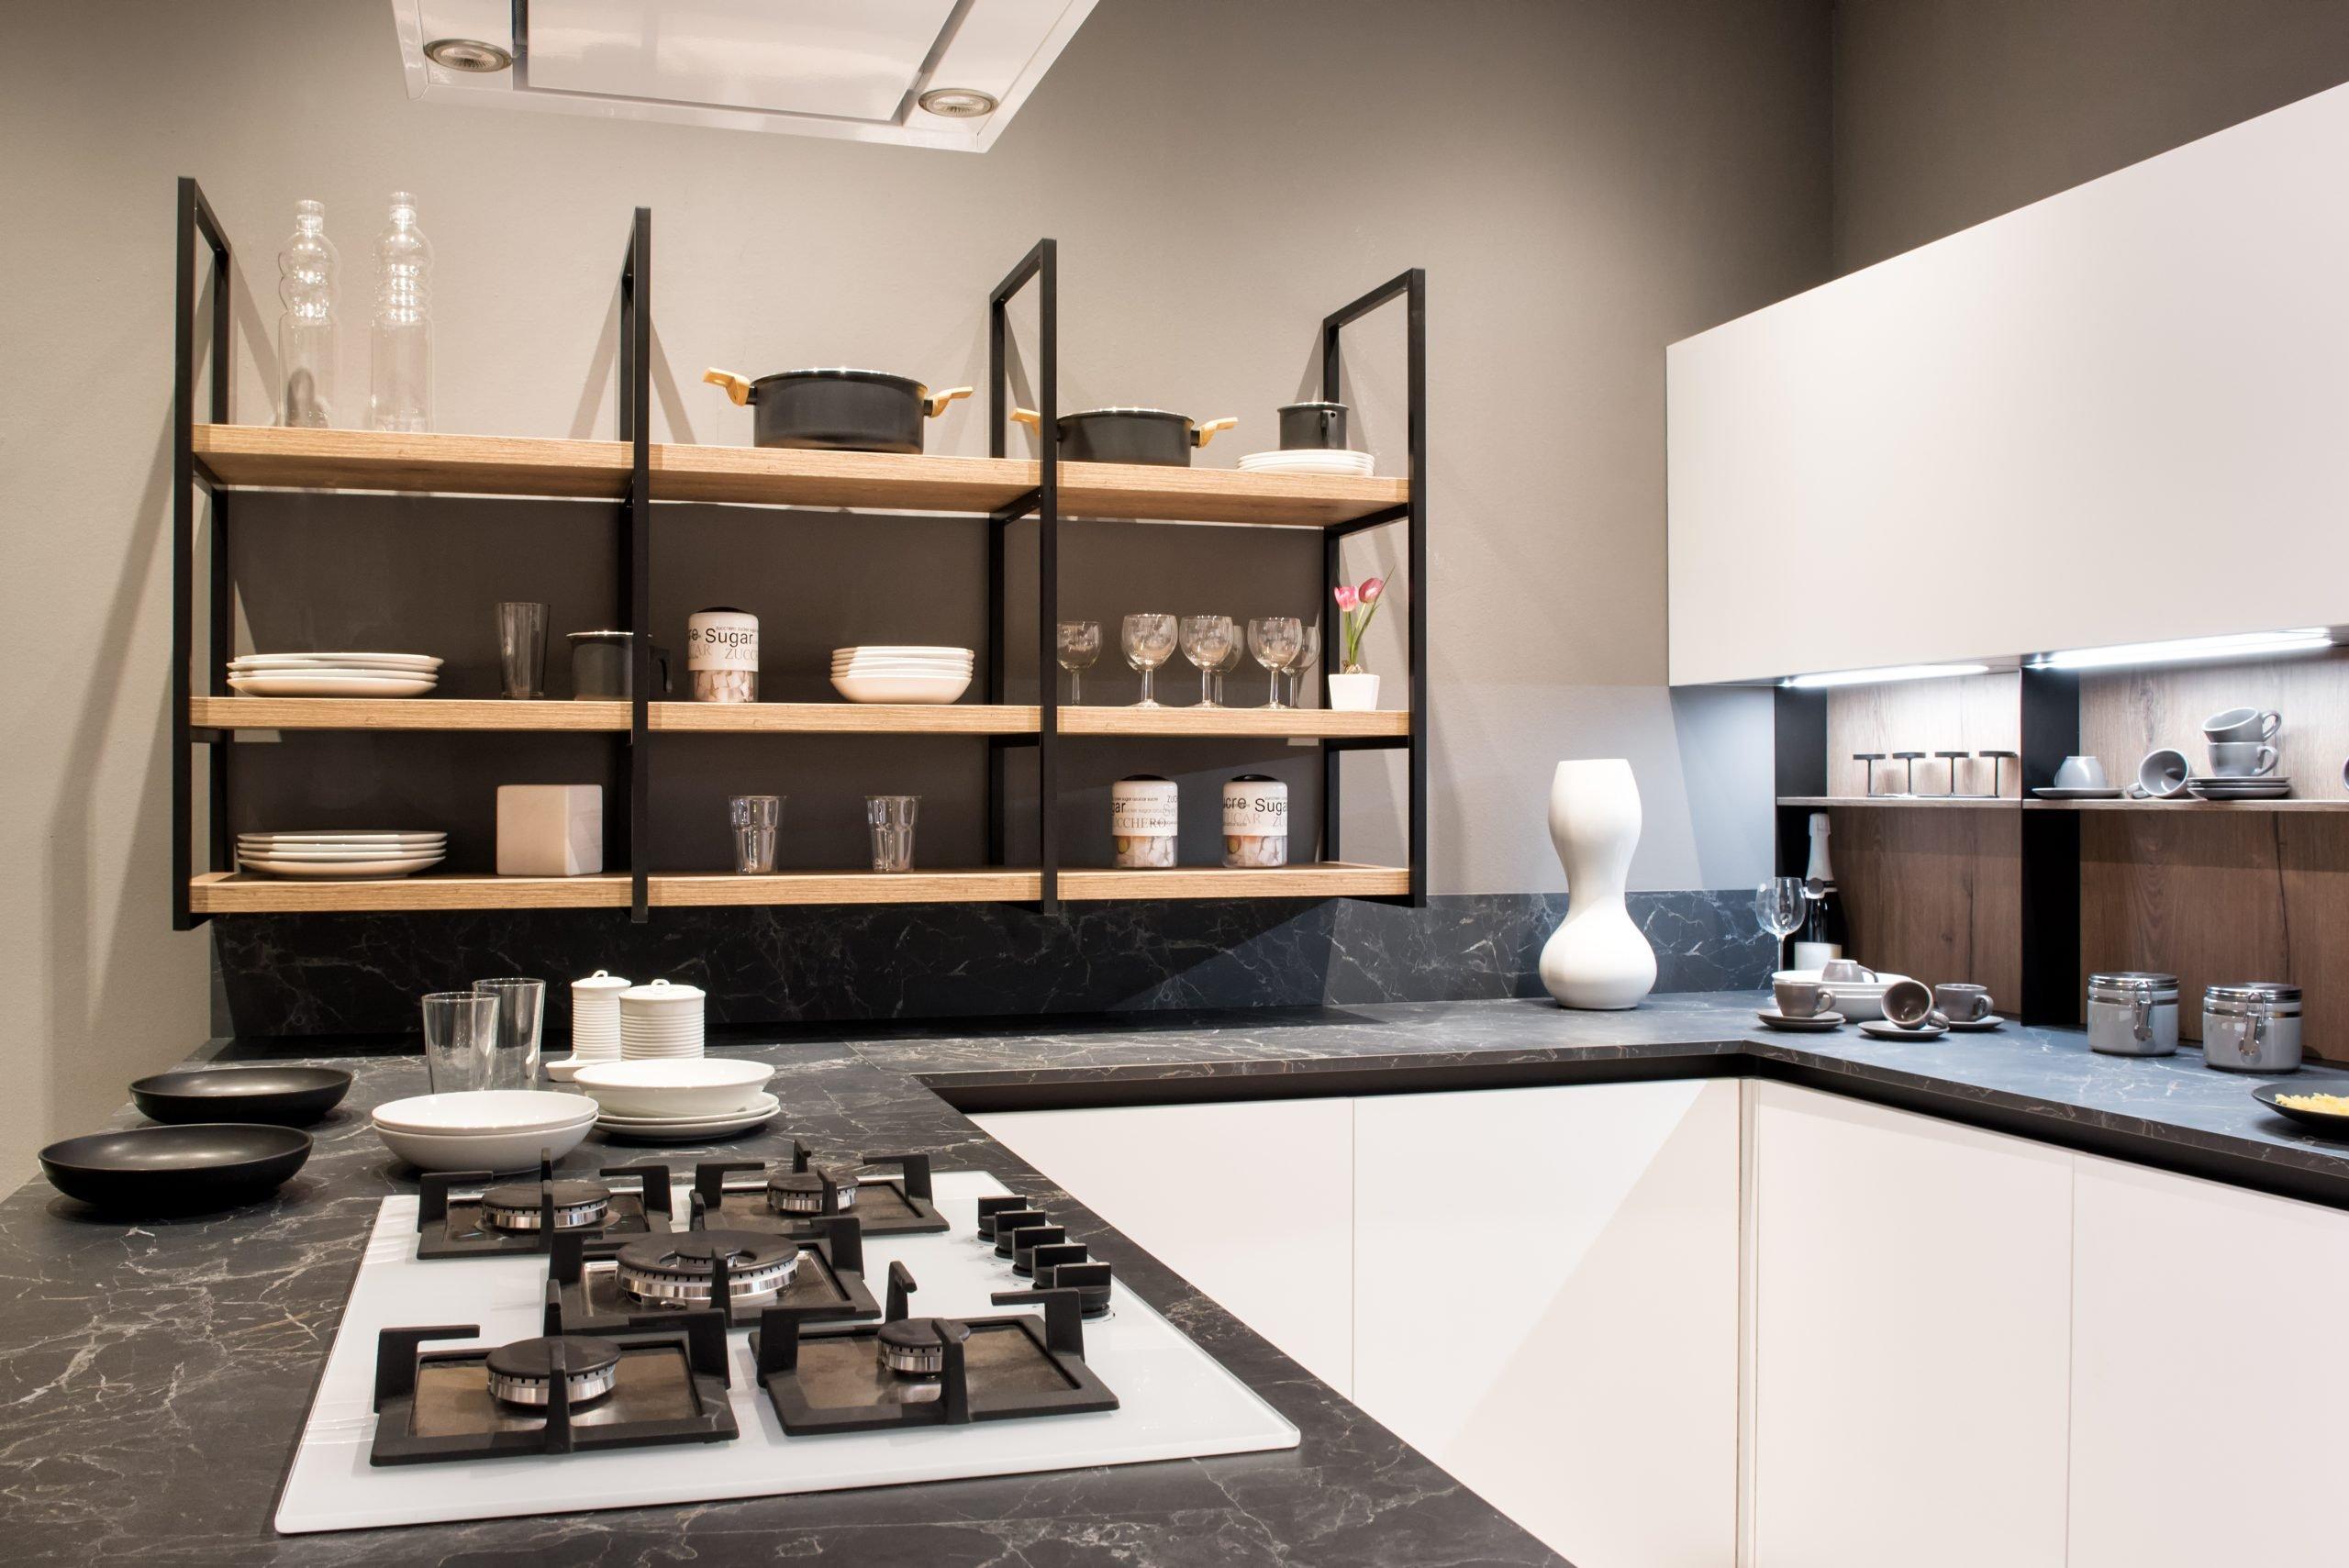 Cocinas Modernas pequeñas estanterias creativas